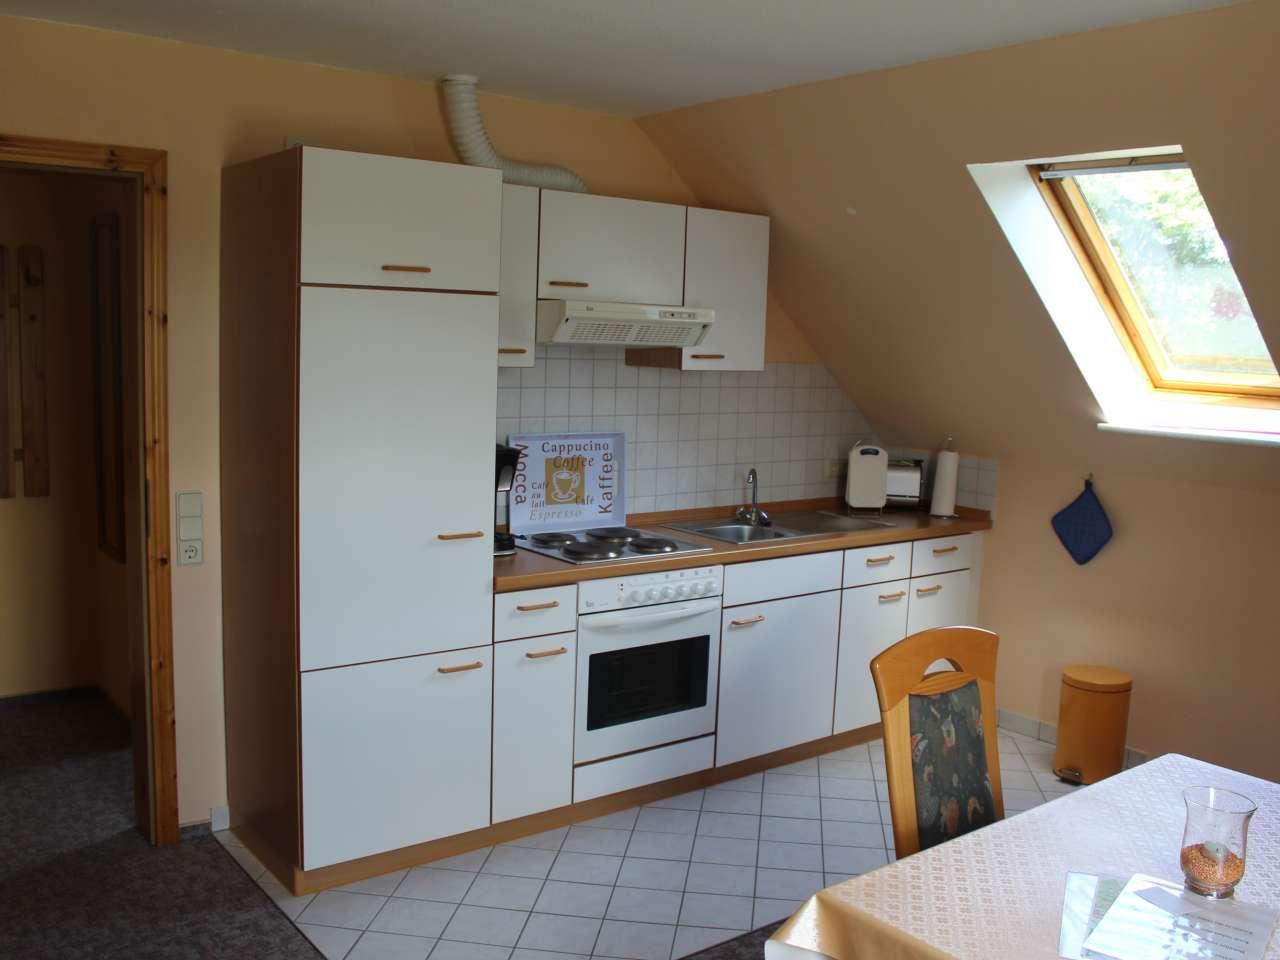 ferienwohnung in heringsdorf ostholstein f r 2 personen heringsdorf l becker. Black Bedroom Furniture Sets. Home Design Ideas